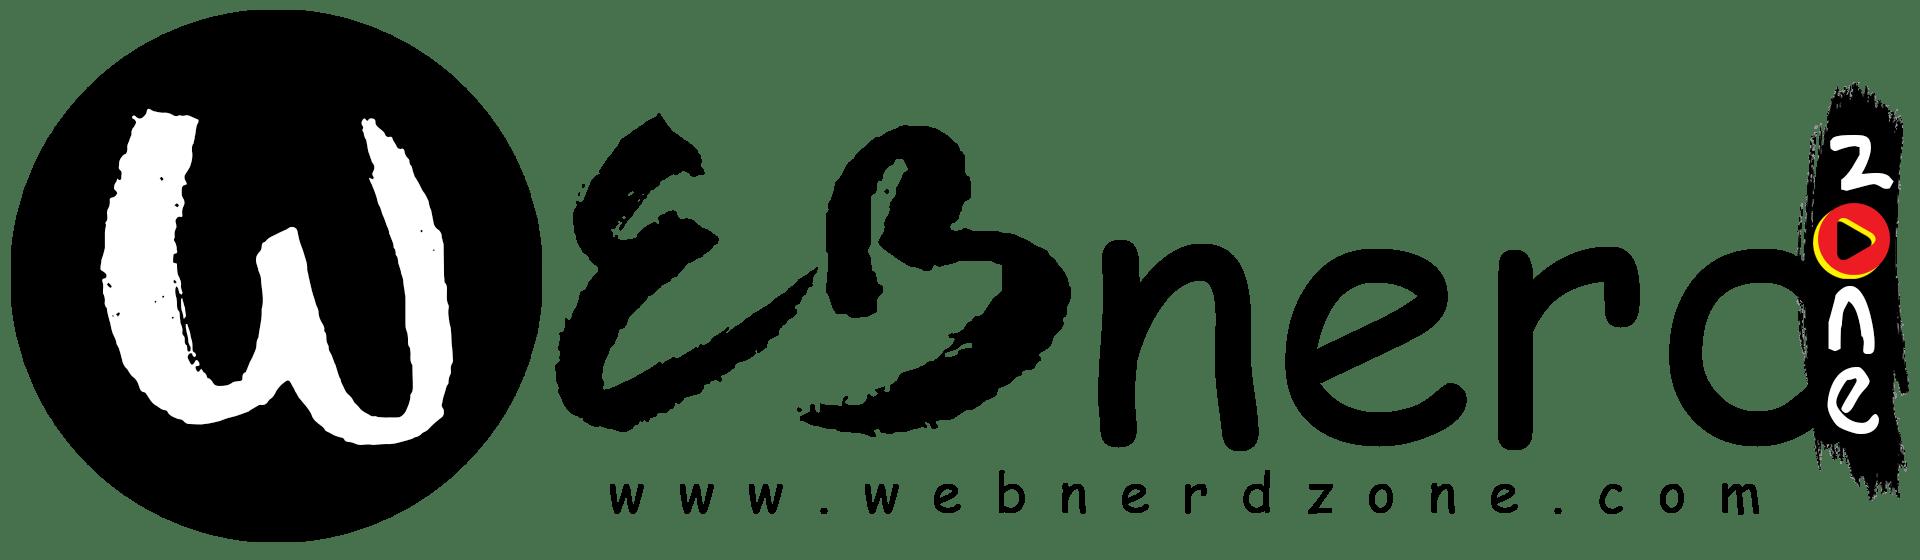 WEBnerd Zone